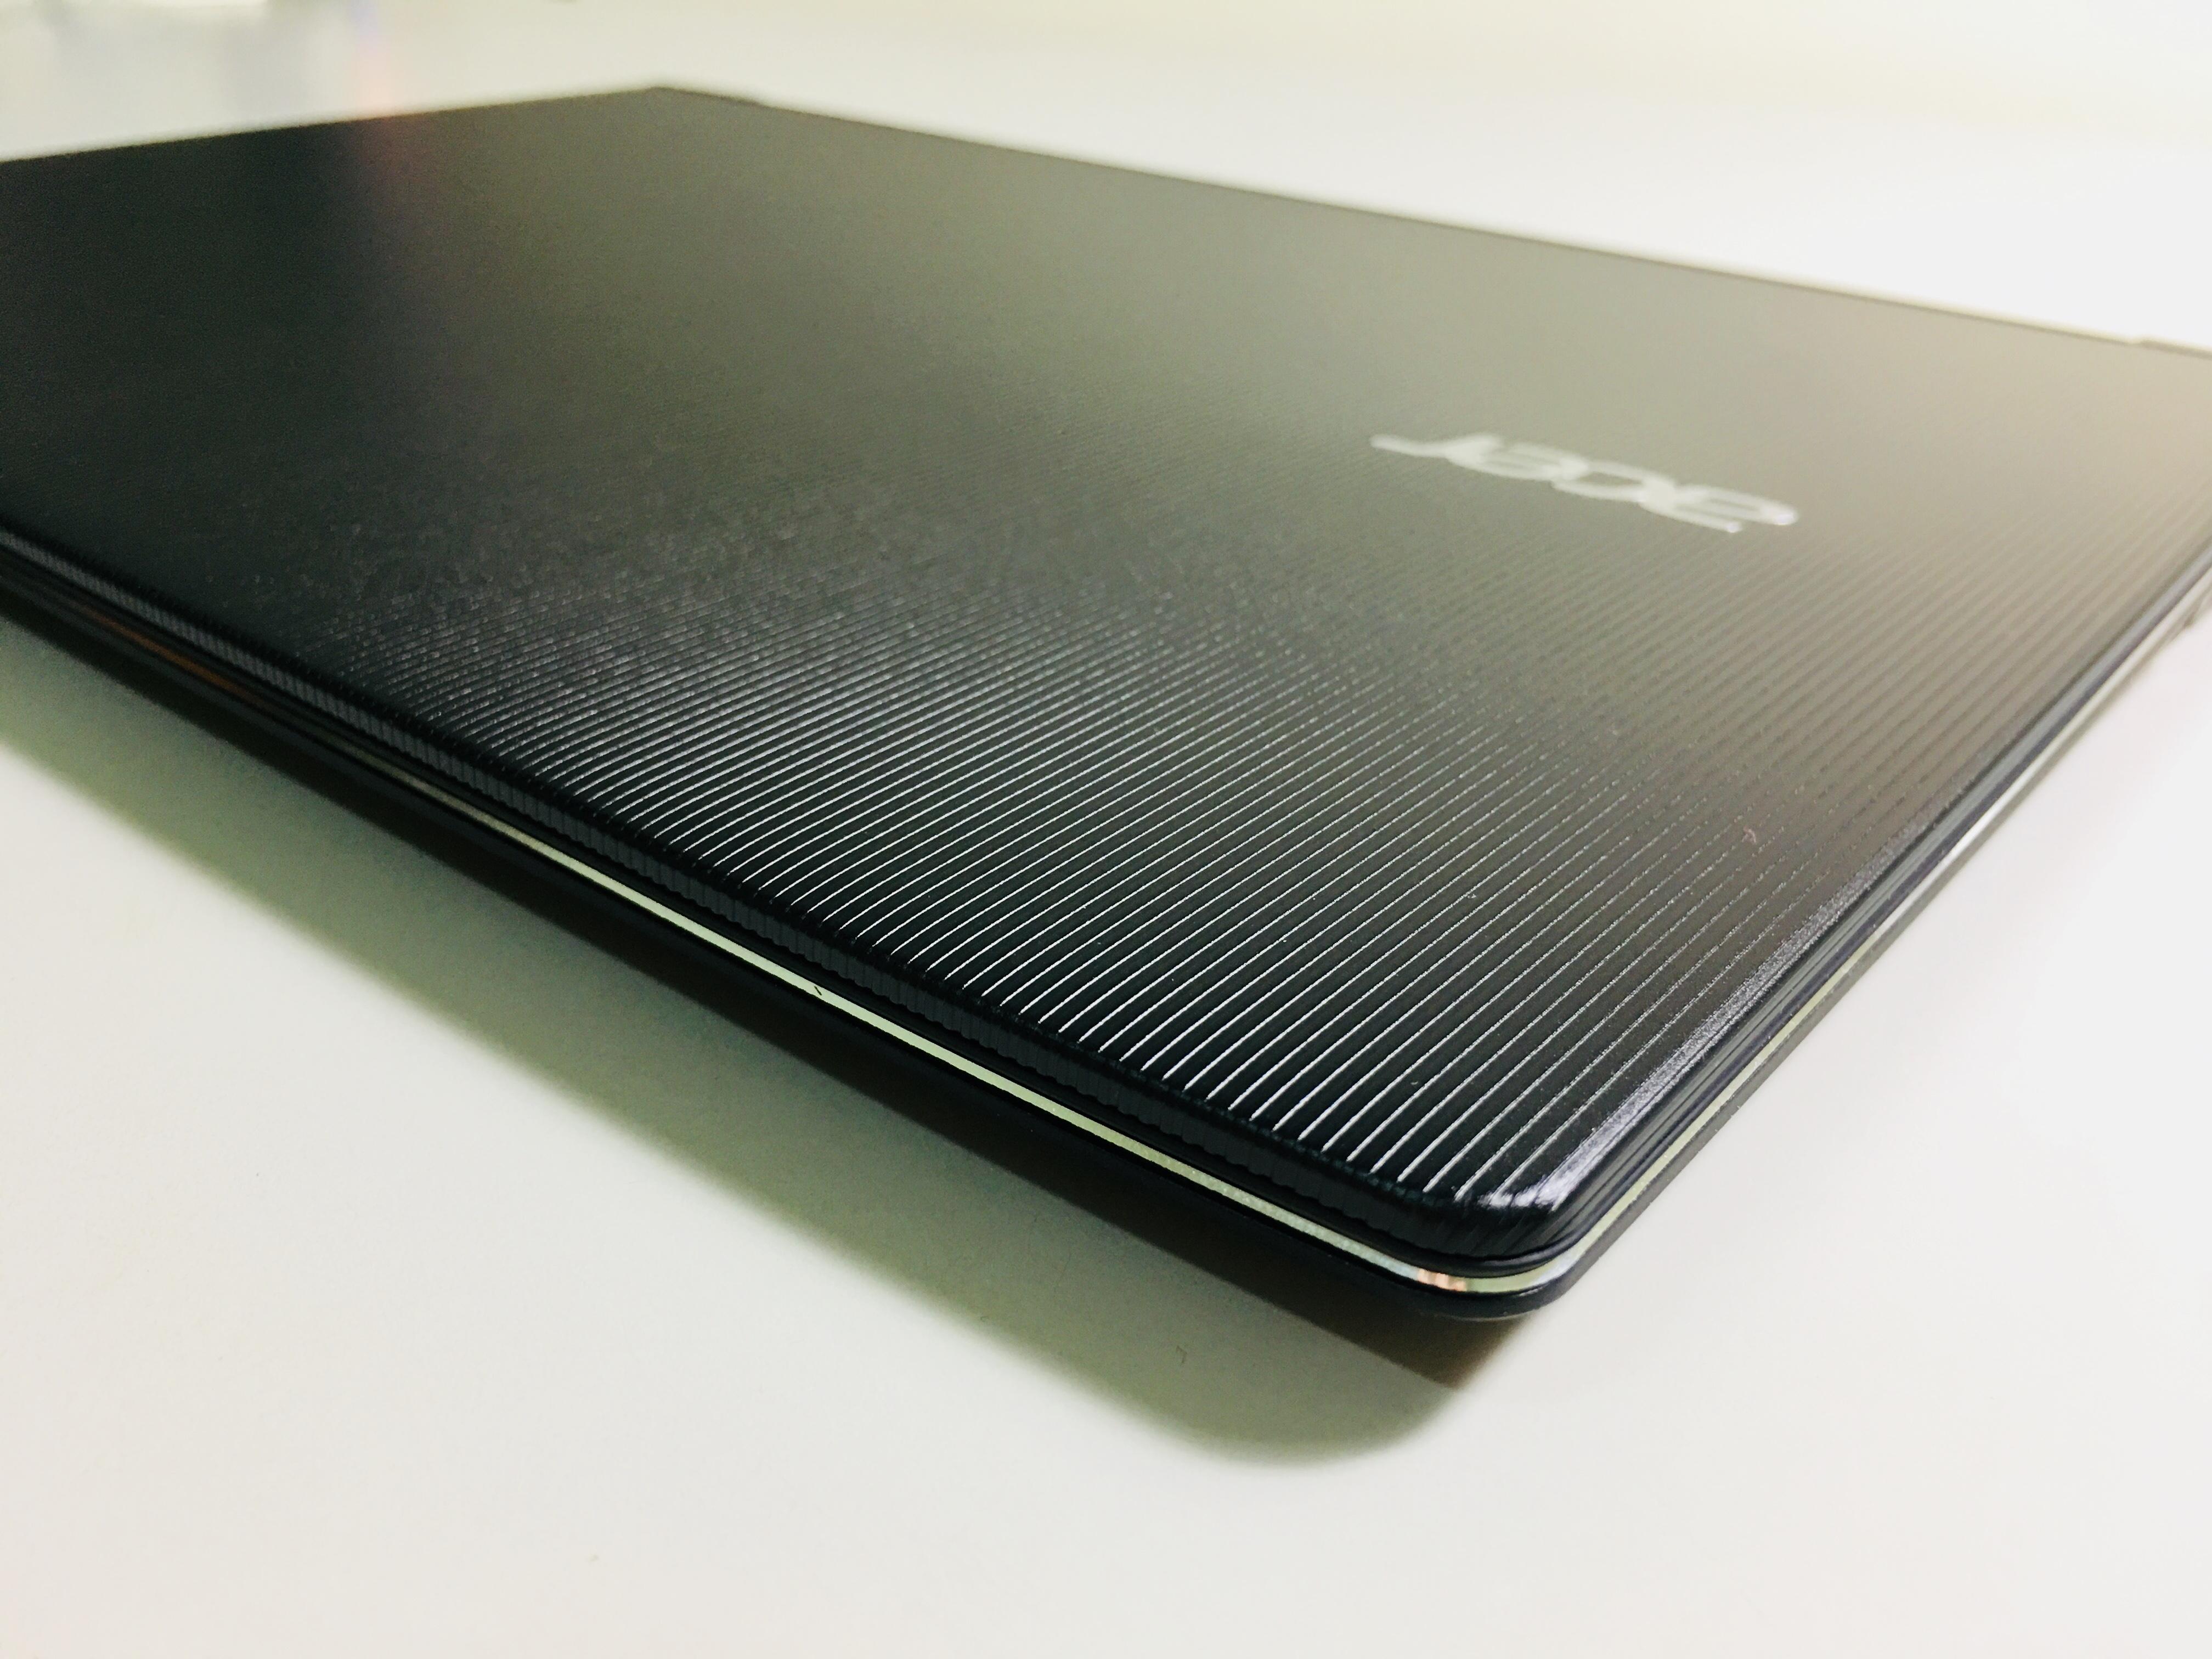 Acer Swift 5機身上蓋採用金屬壓印設計,右側印有Acer字樣,但非給使用人看的XD